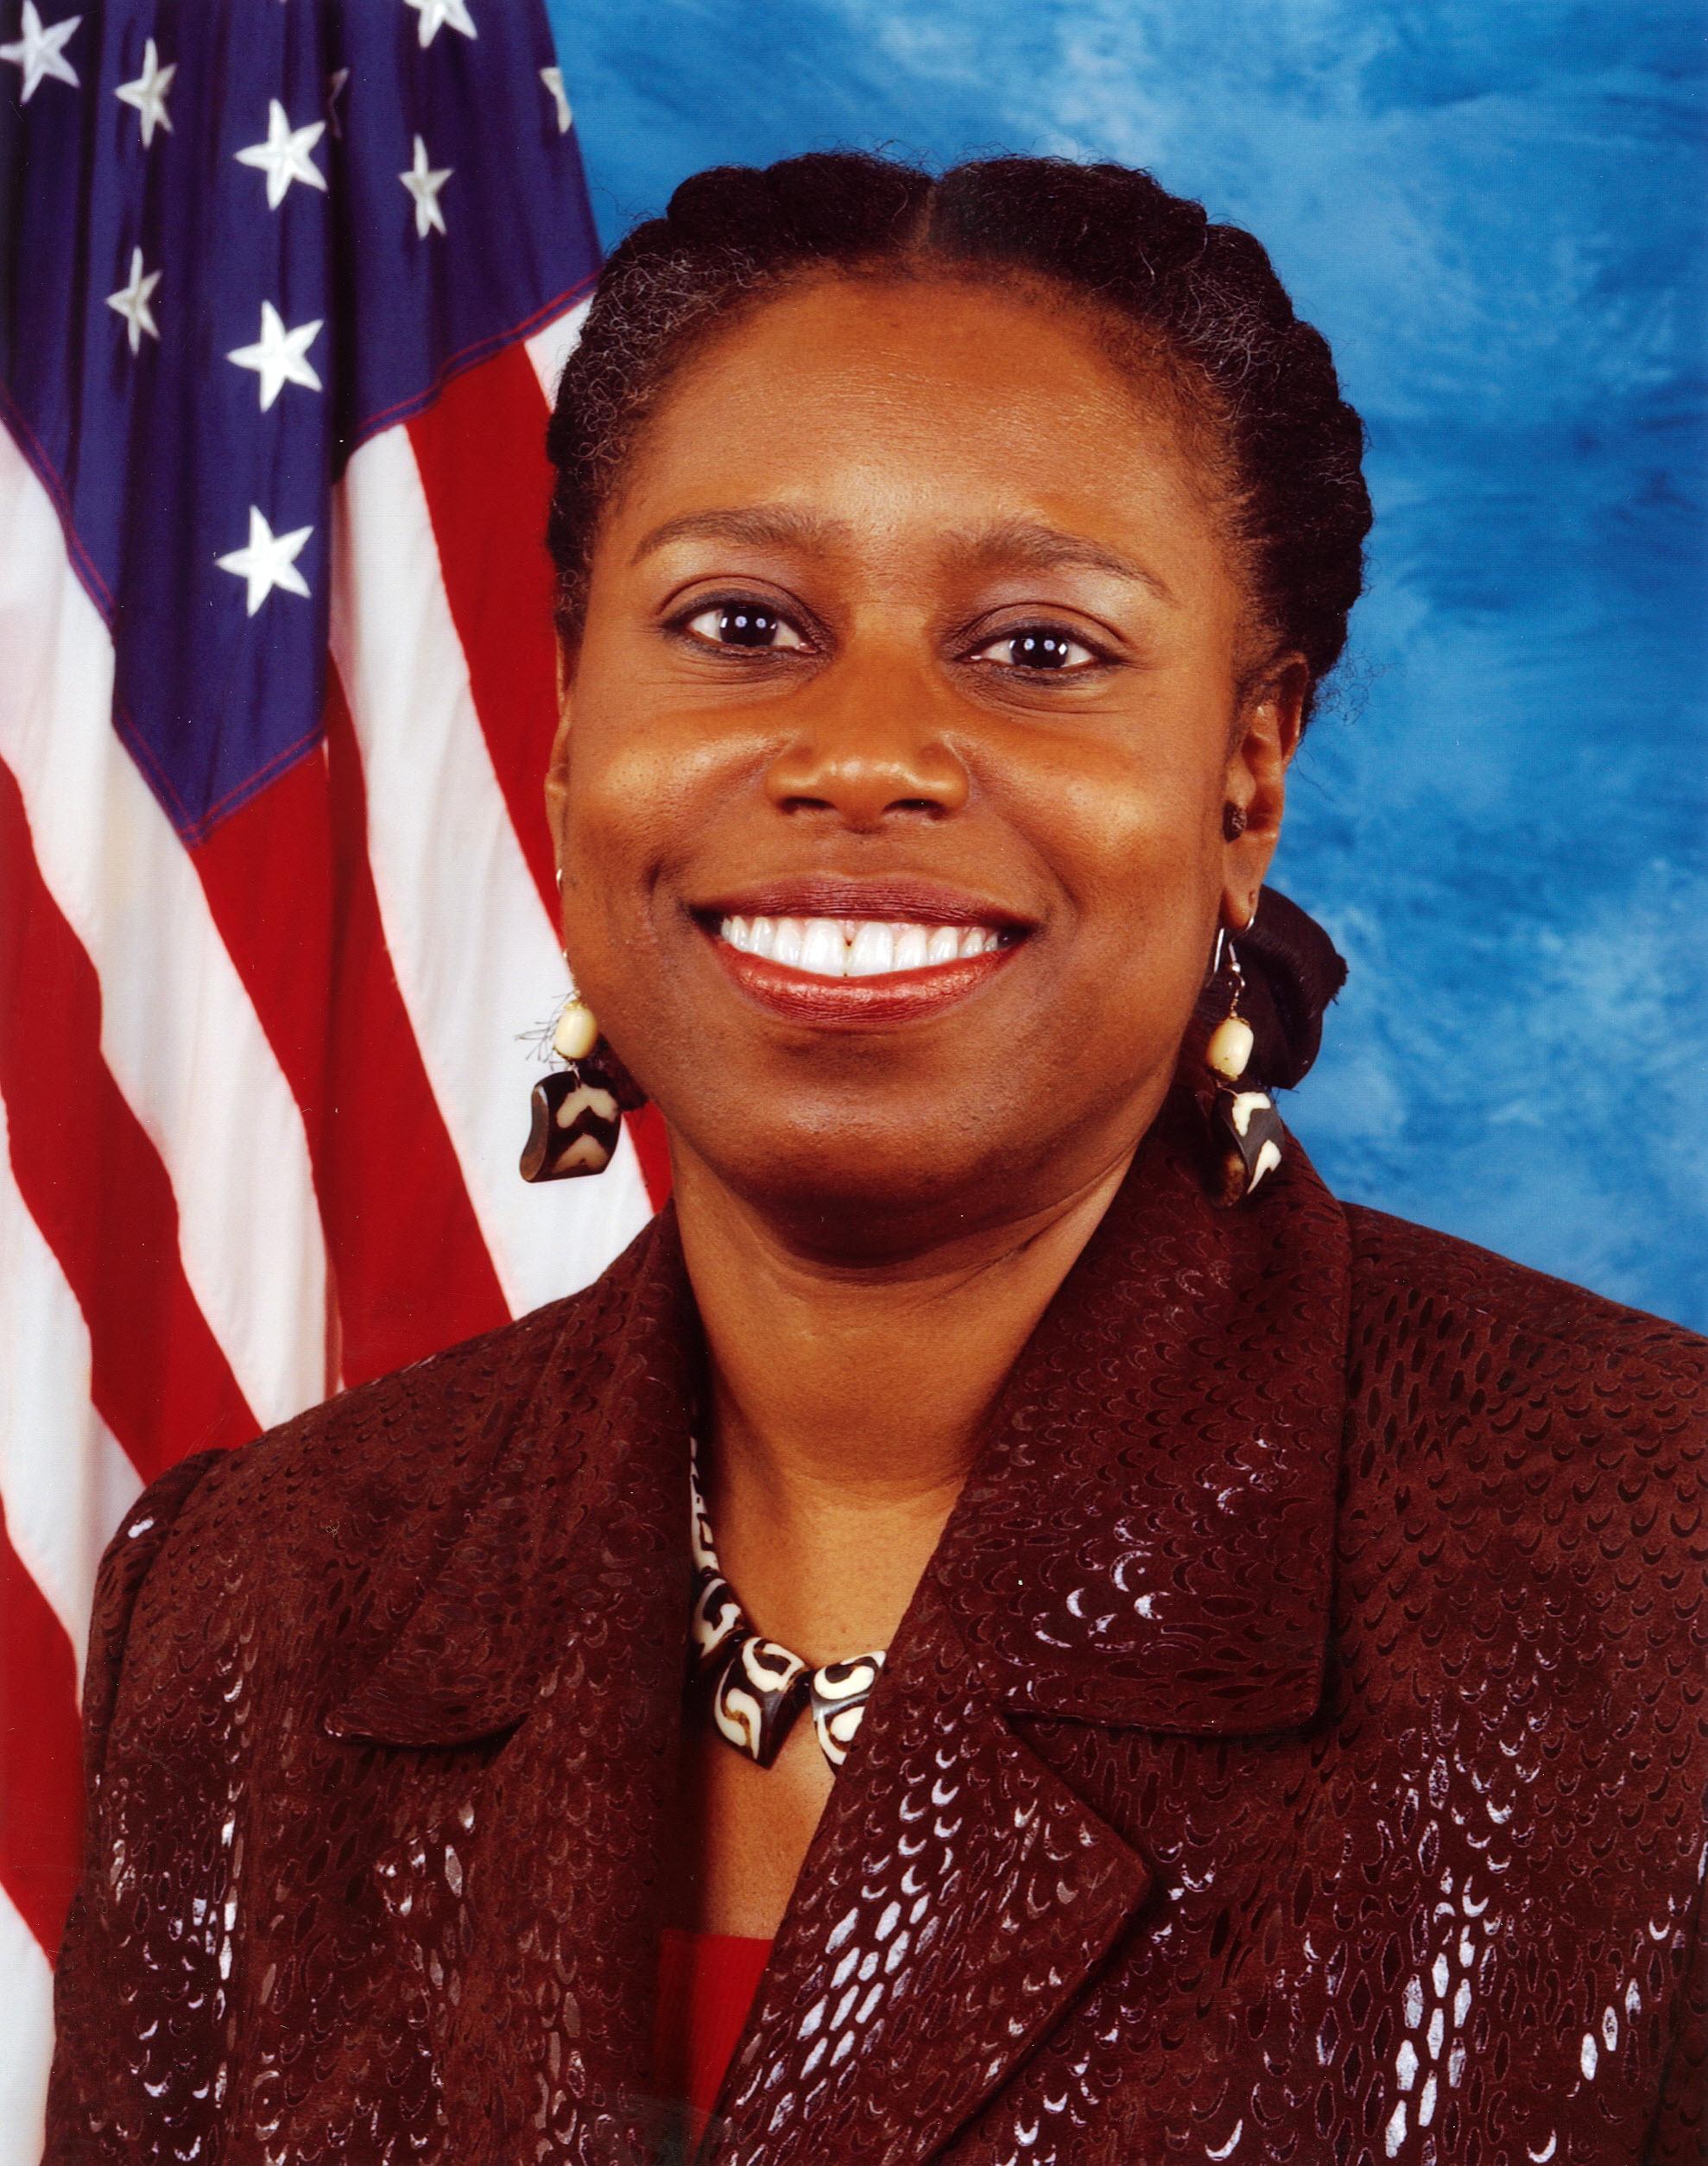 Cynthia McKinney's Congressional photo.